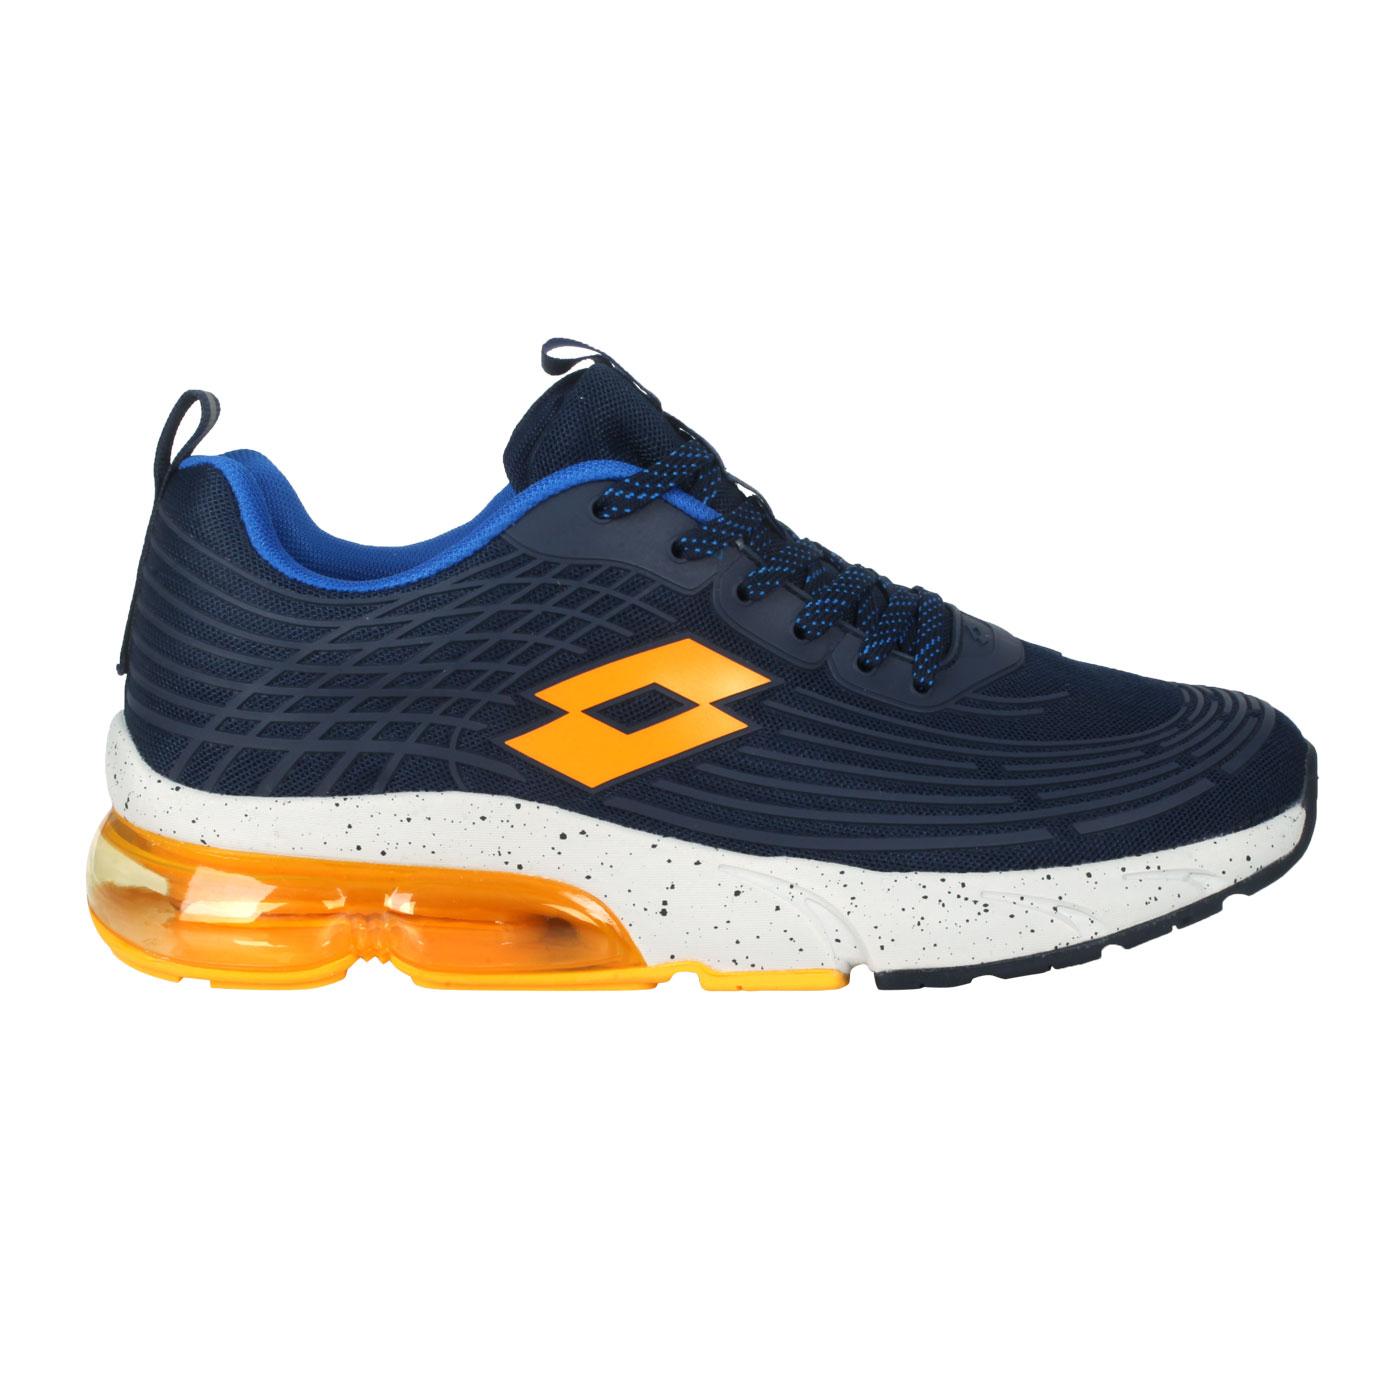 LOTTO 男款氣墊樂跑KPU運動鞋 LT1AMR3106 - 丈青藍黃